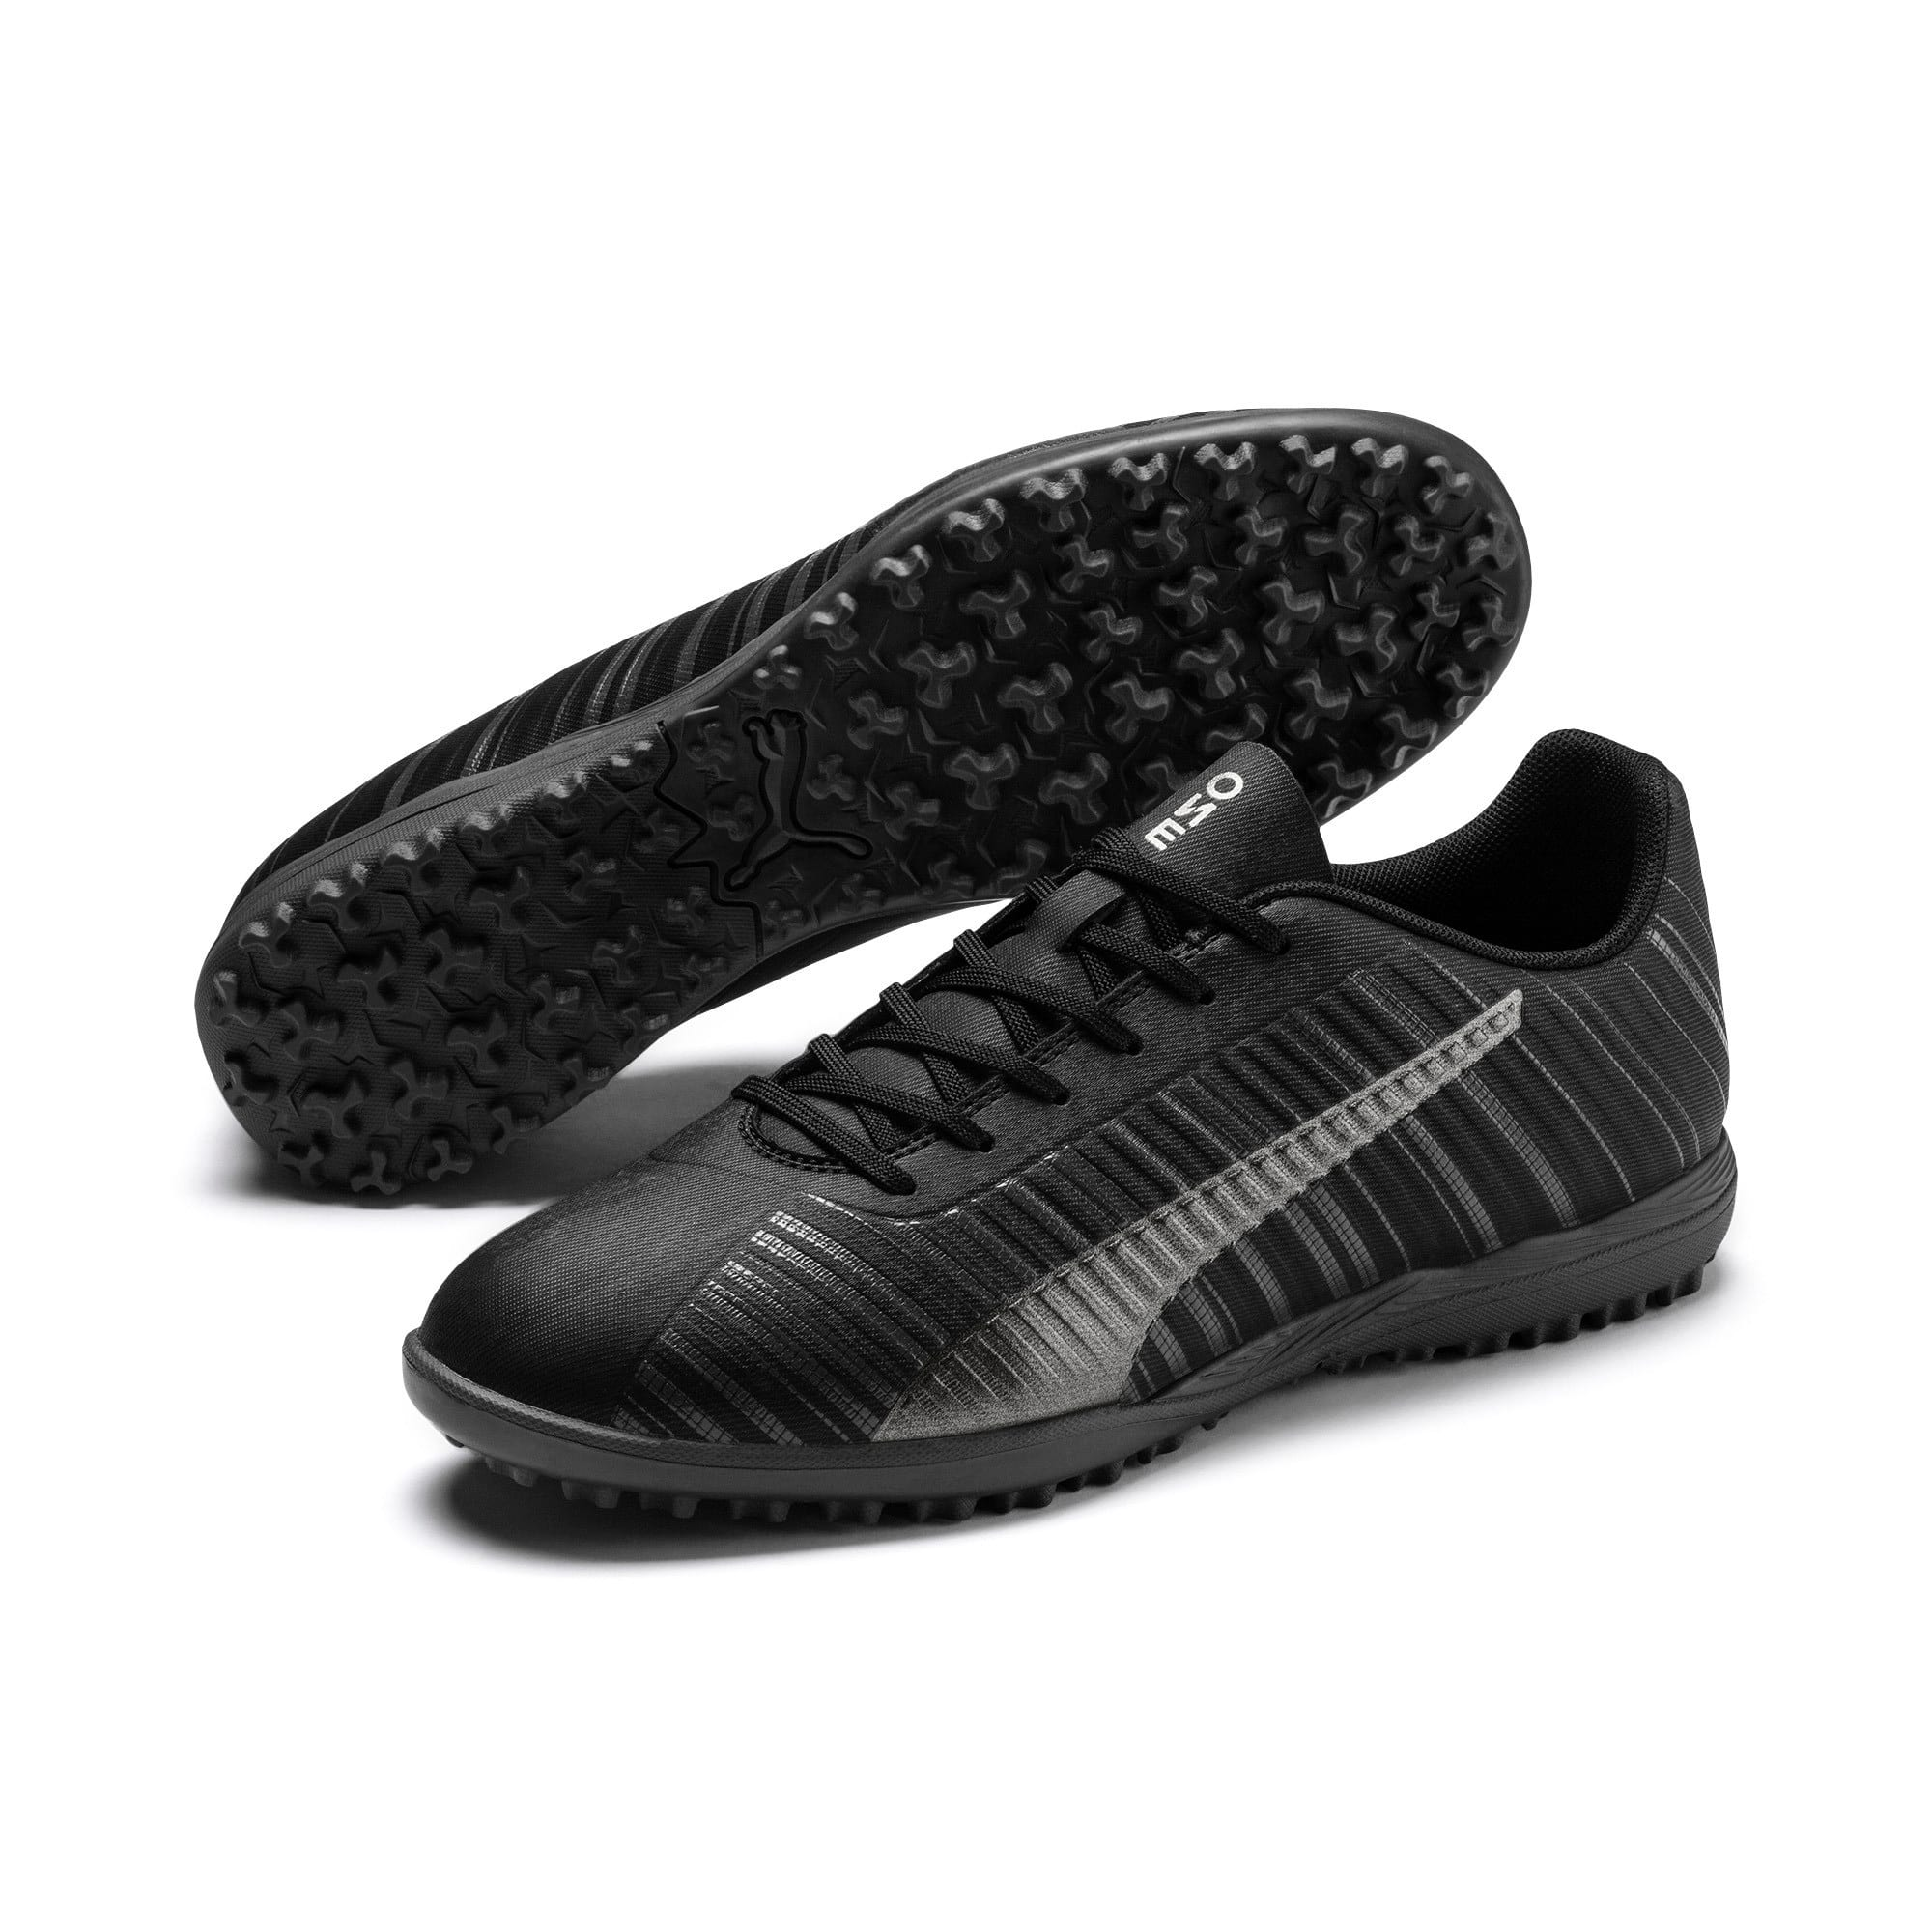 Thumbnail 3 of PUMA ONE 5.4 TT Men's Soccer Shoes, Black-Black-Puma Aged Silver, medium